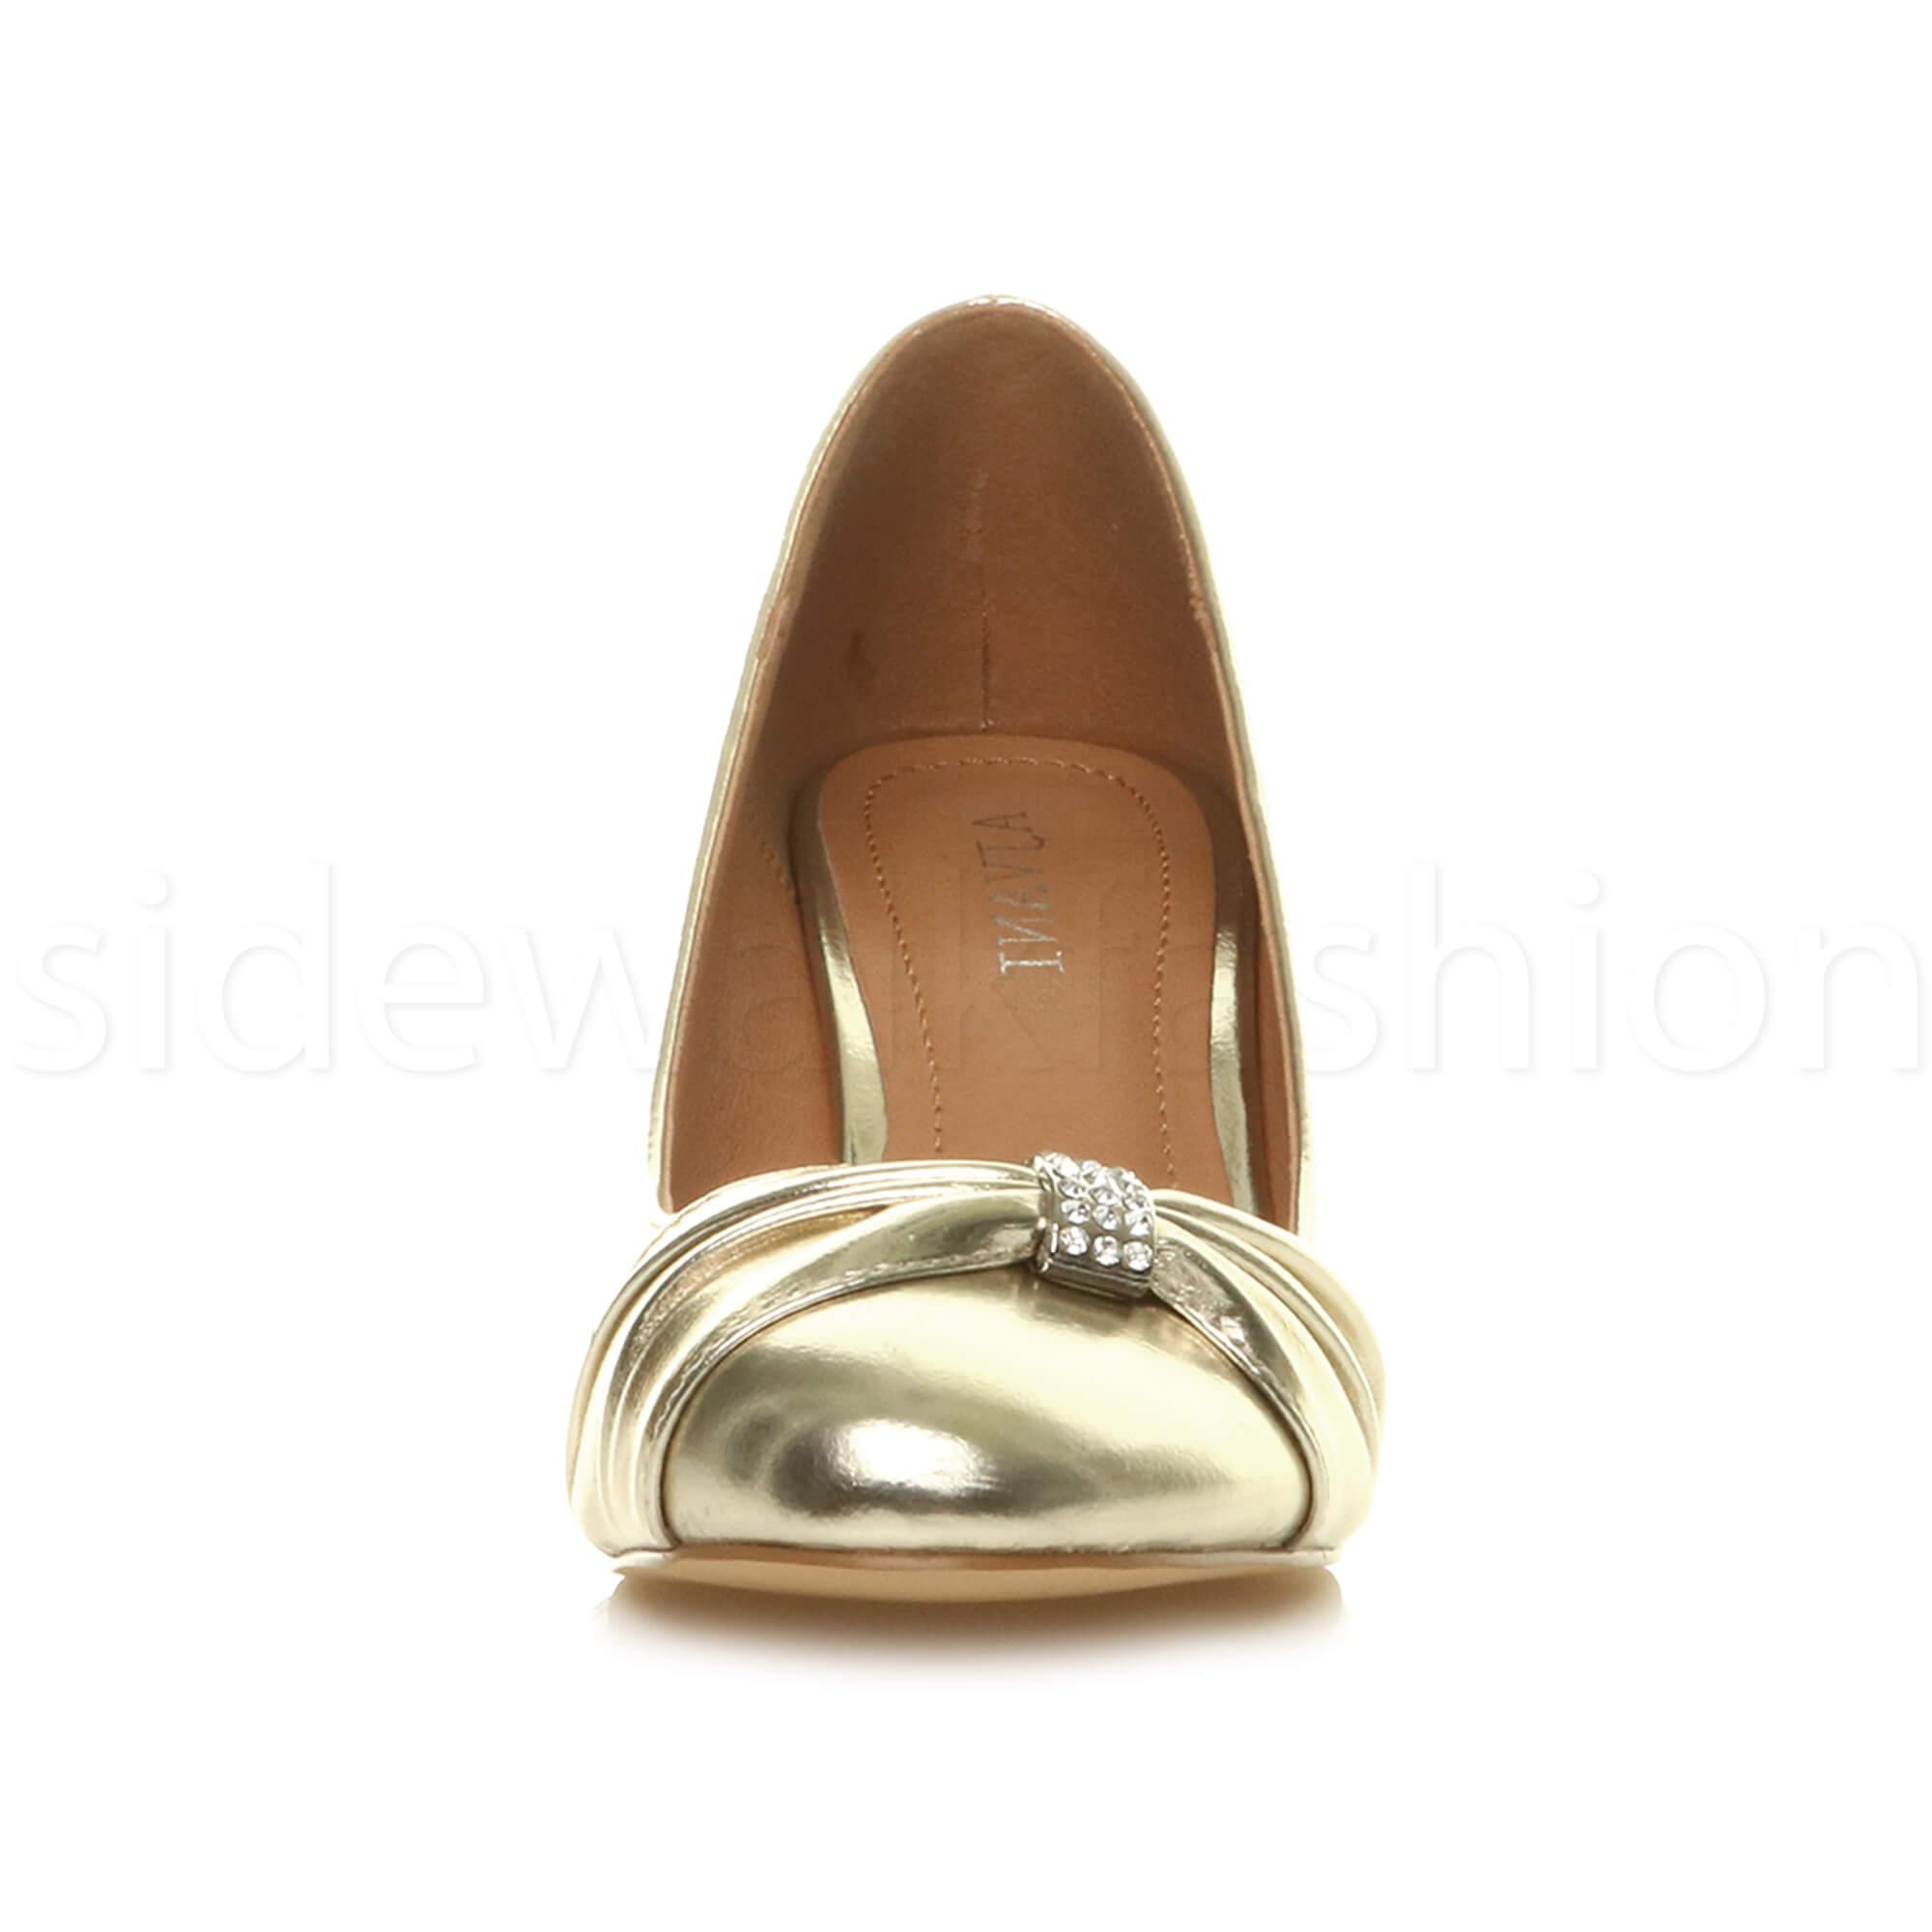 Womens-ladies-low-mid-heel-diamante-party-smart-evening-court-shoes-size thumbnail 31